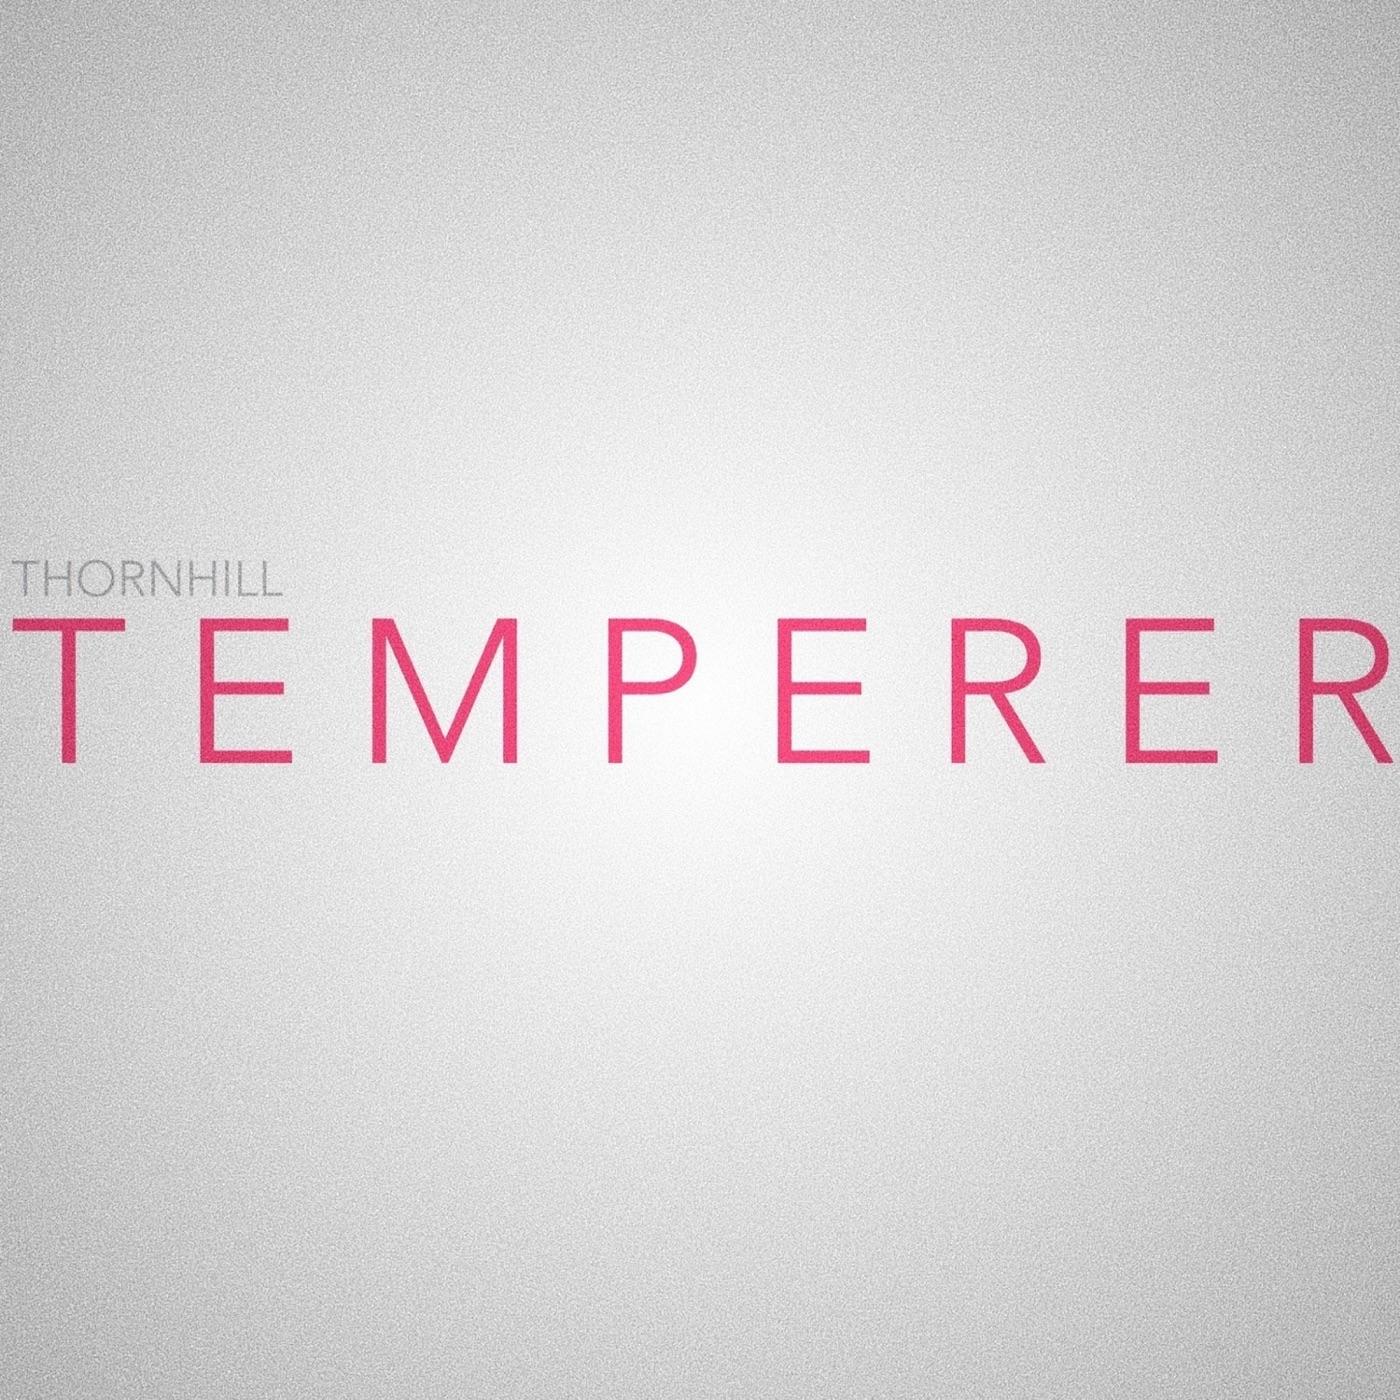 Thornhill - Temperer [single] (2017)